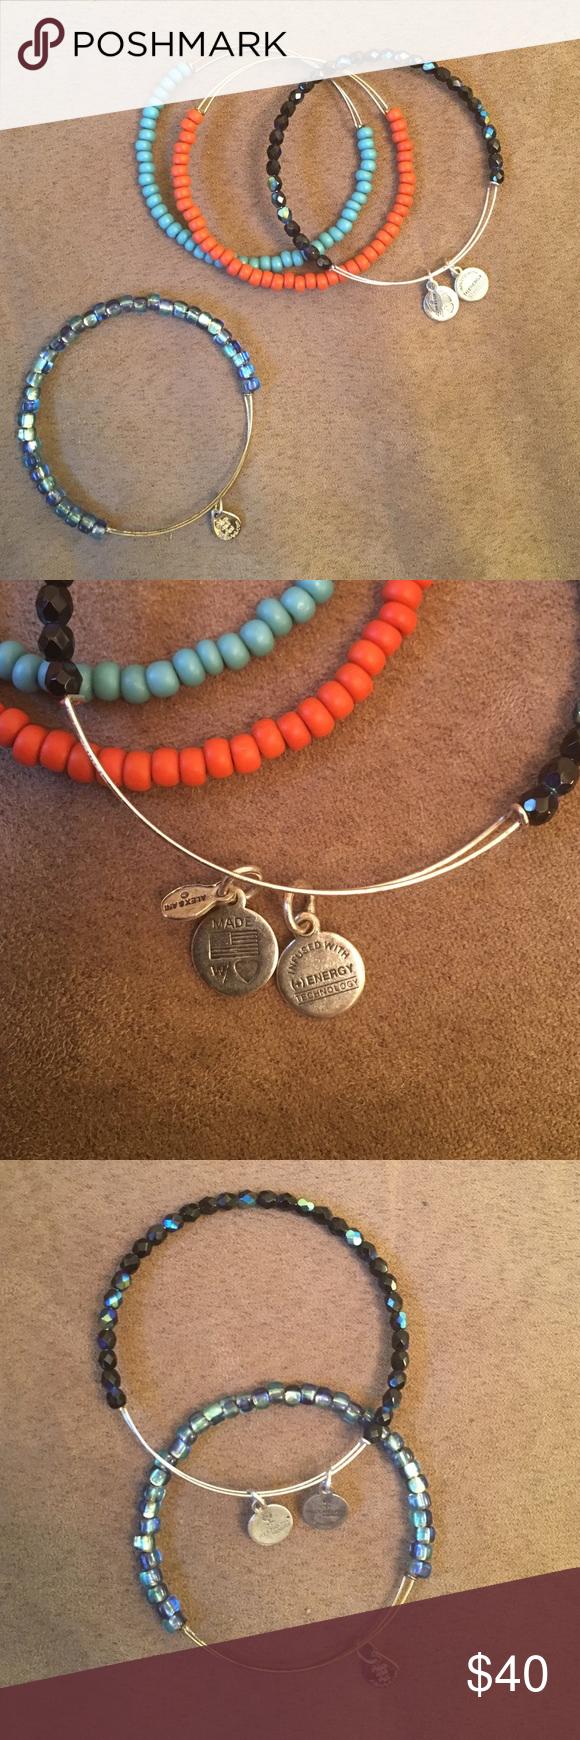 Alex and Annie beaded bracelet bundle. Assortment of four ...